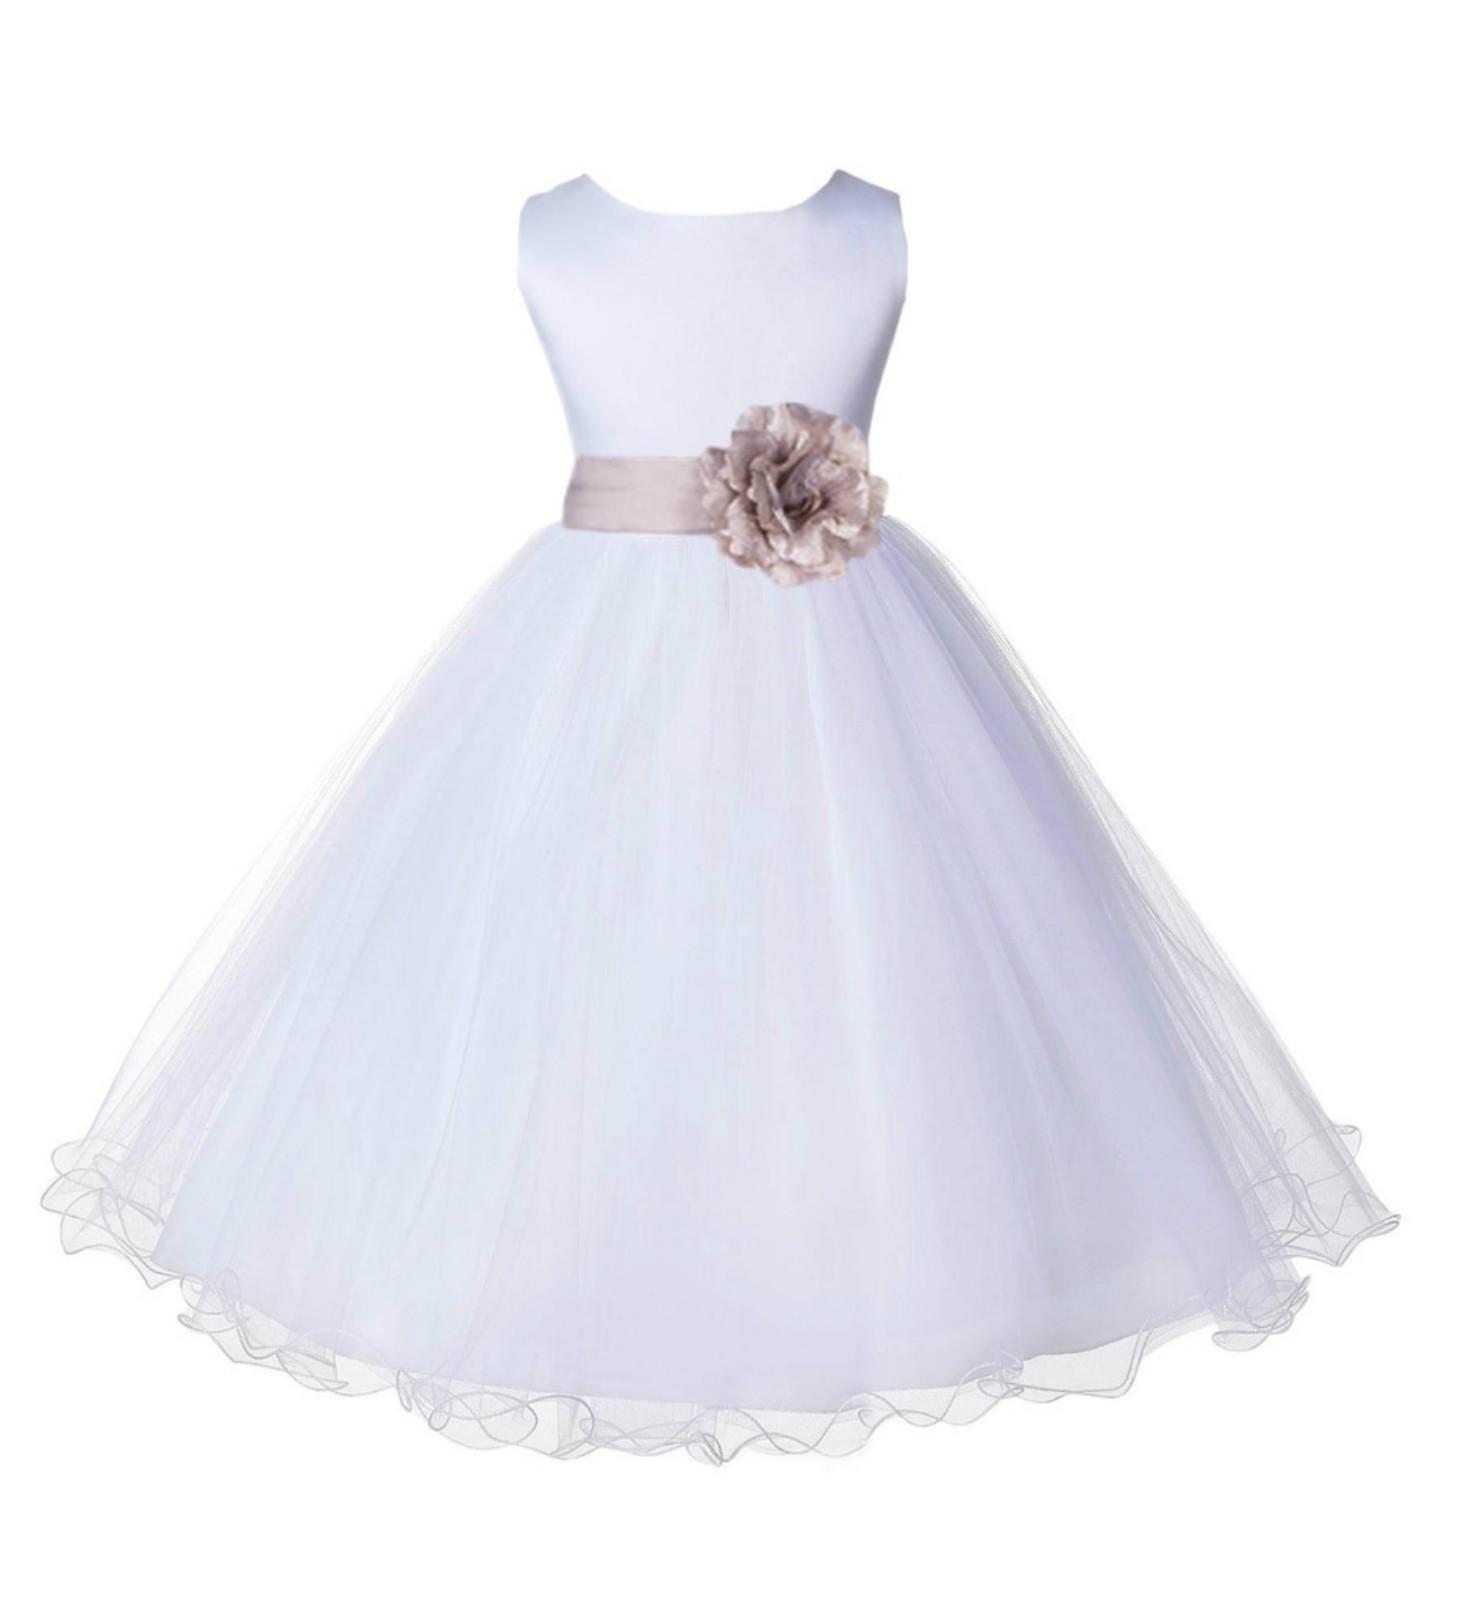 White/Biscuit Tulle Rattail Edge Flower Girl Dress Wedding Bridal 829S